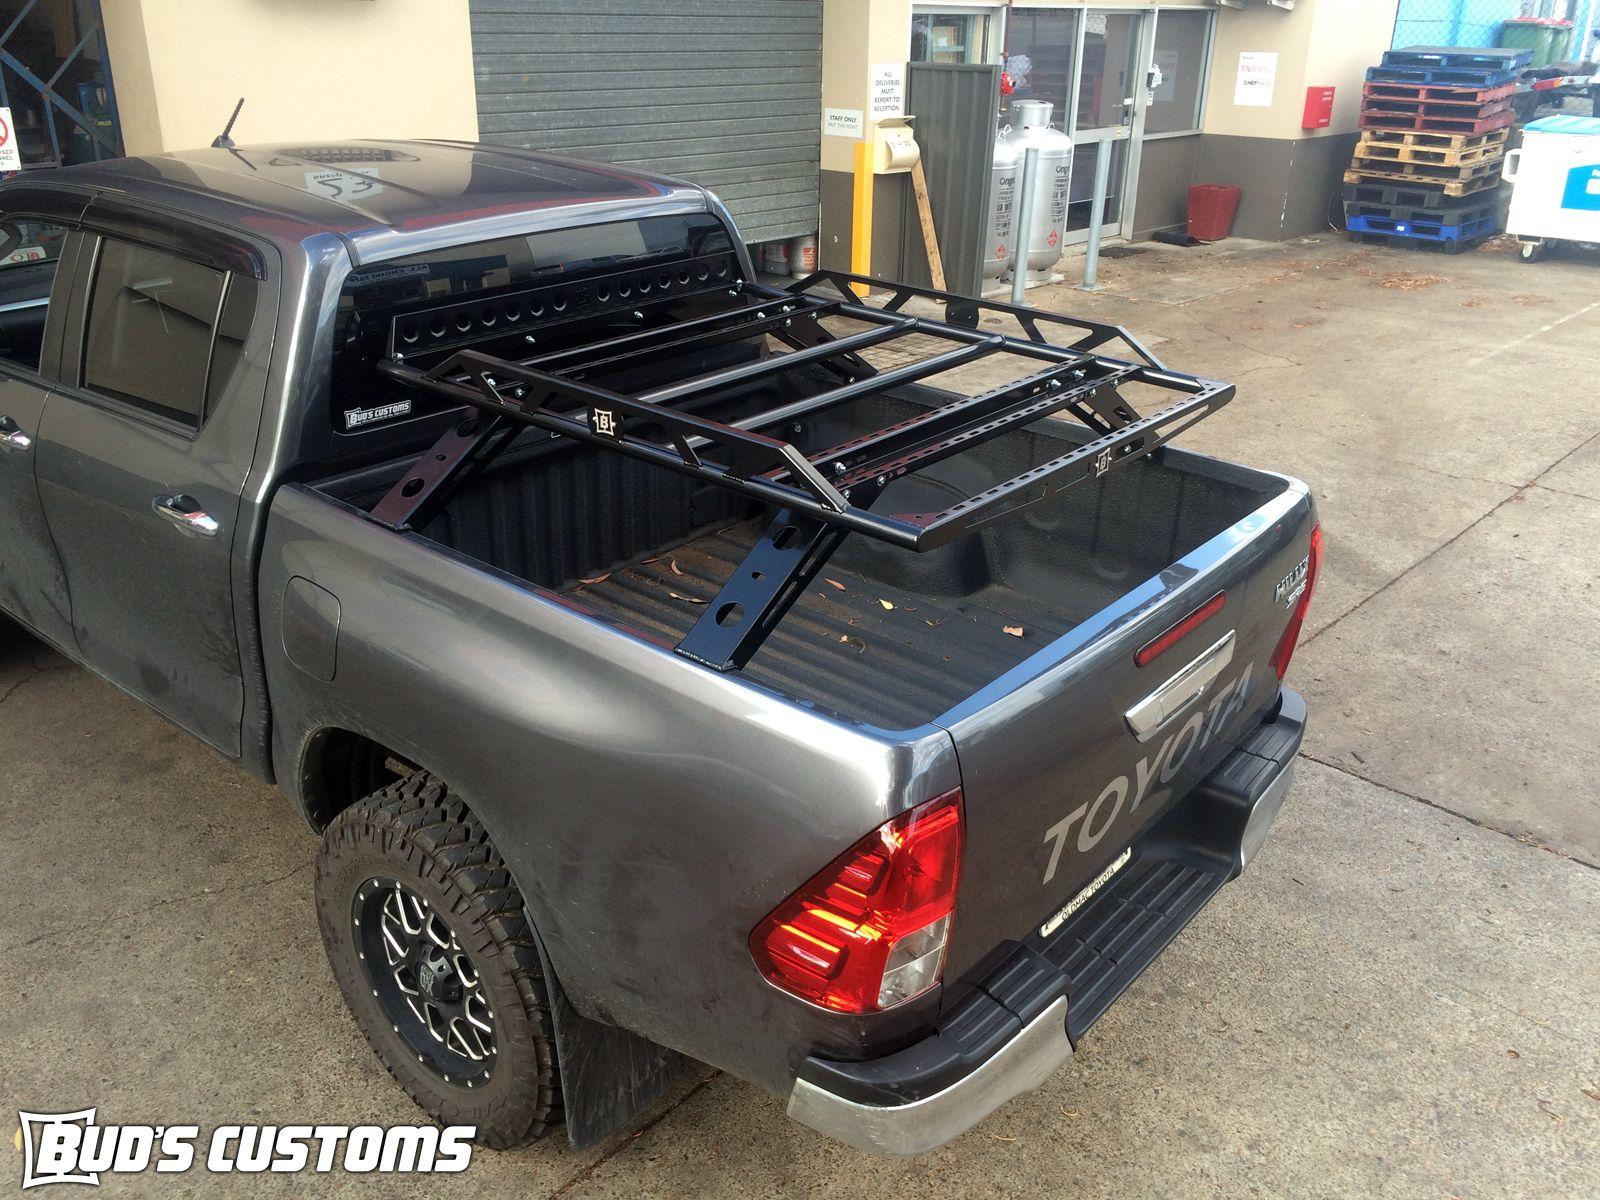 HILUX 05+ DUAL CAB 1.4M LONG TUB RACK | Car Stuff | Pinterest | Tubs ...